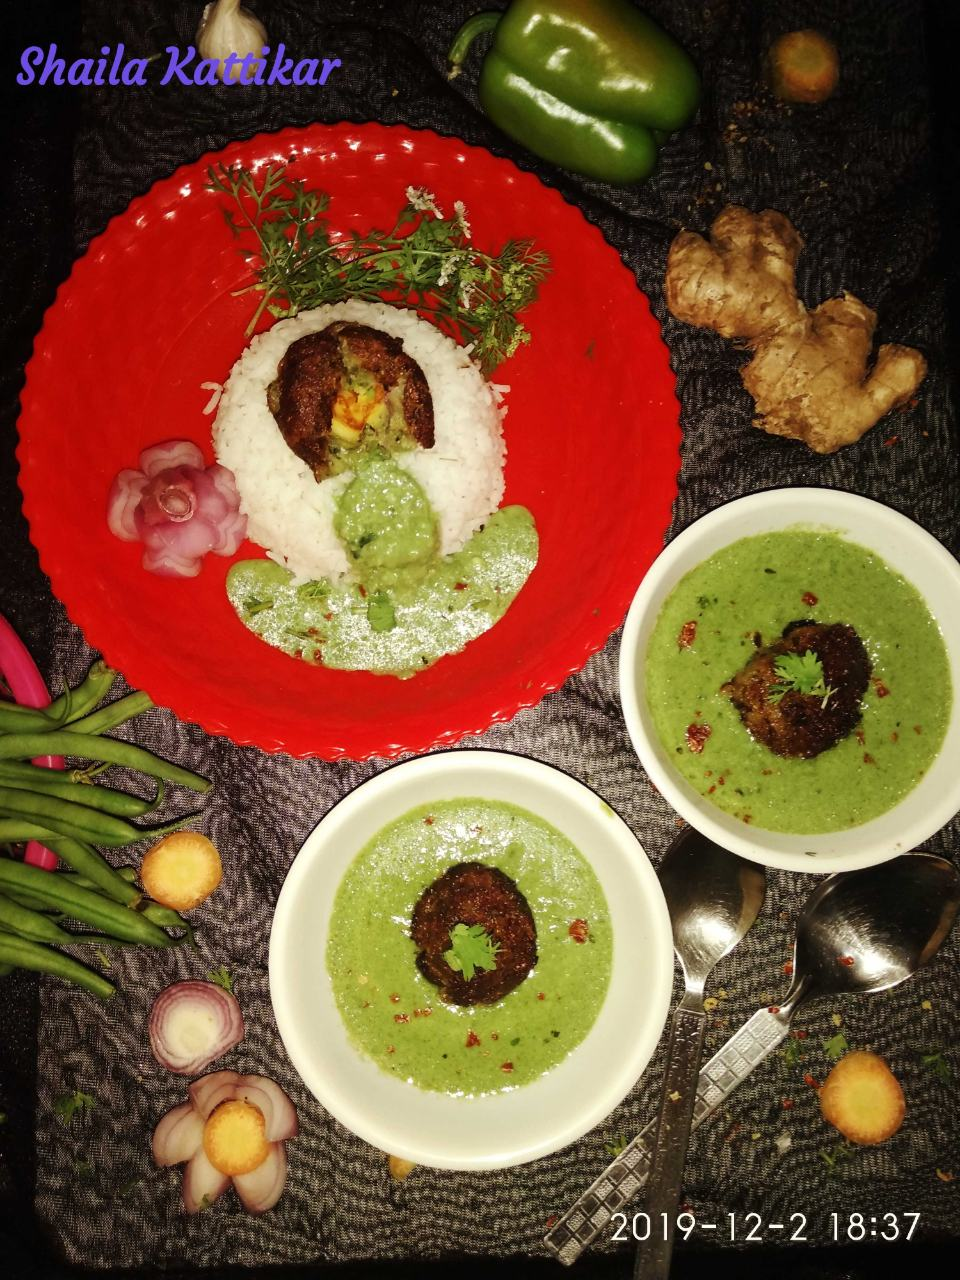 Stuffed Paneer With veggies Kofta In Creamy Spinach Gravy